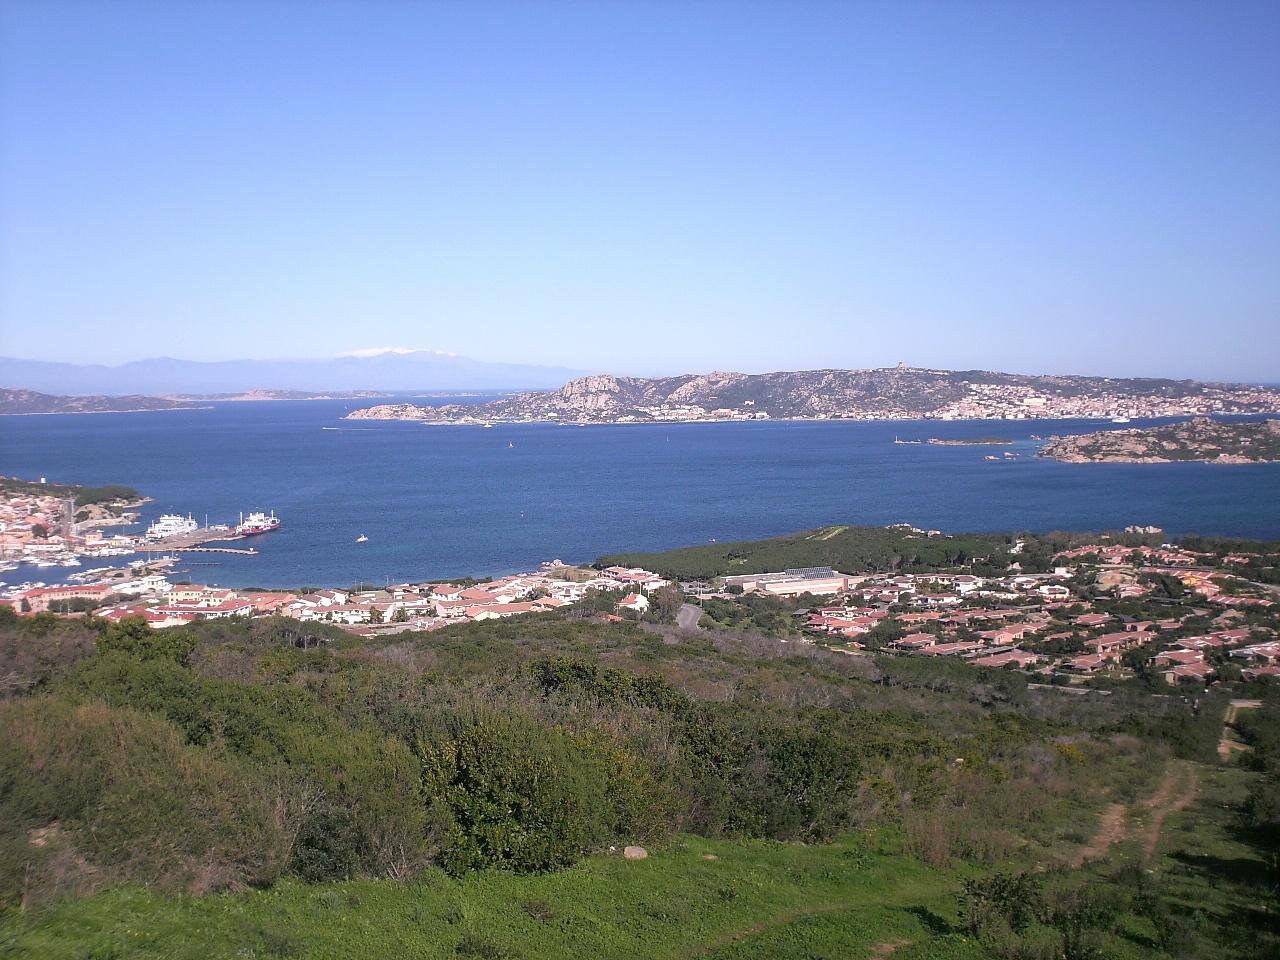 Noleggio Barche La Maddalena - Navalia | Noleggia un Sogno